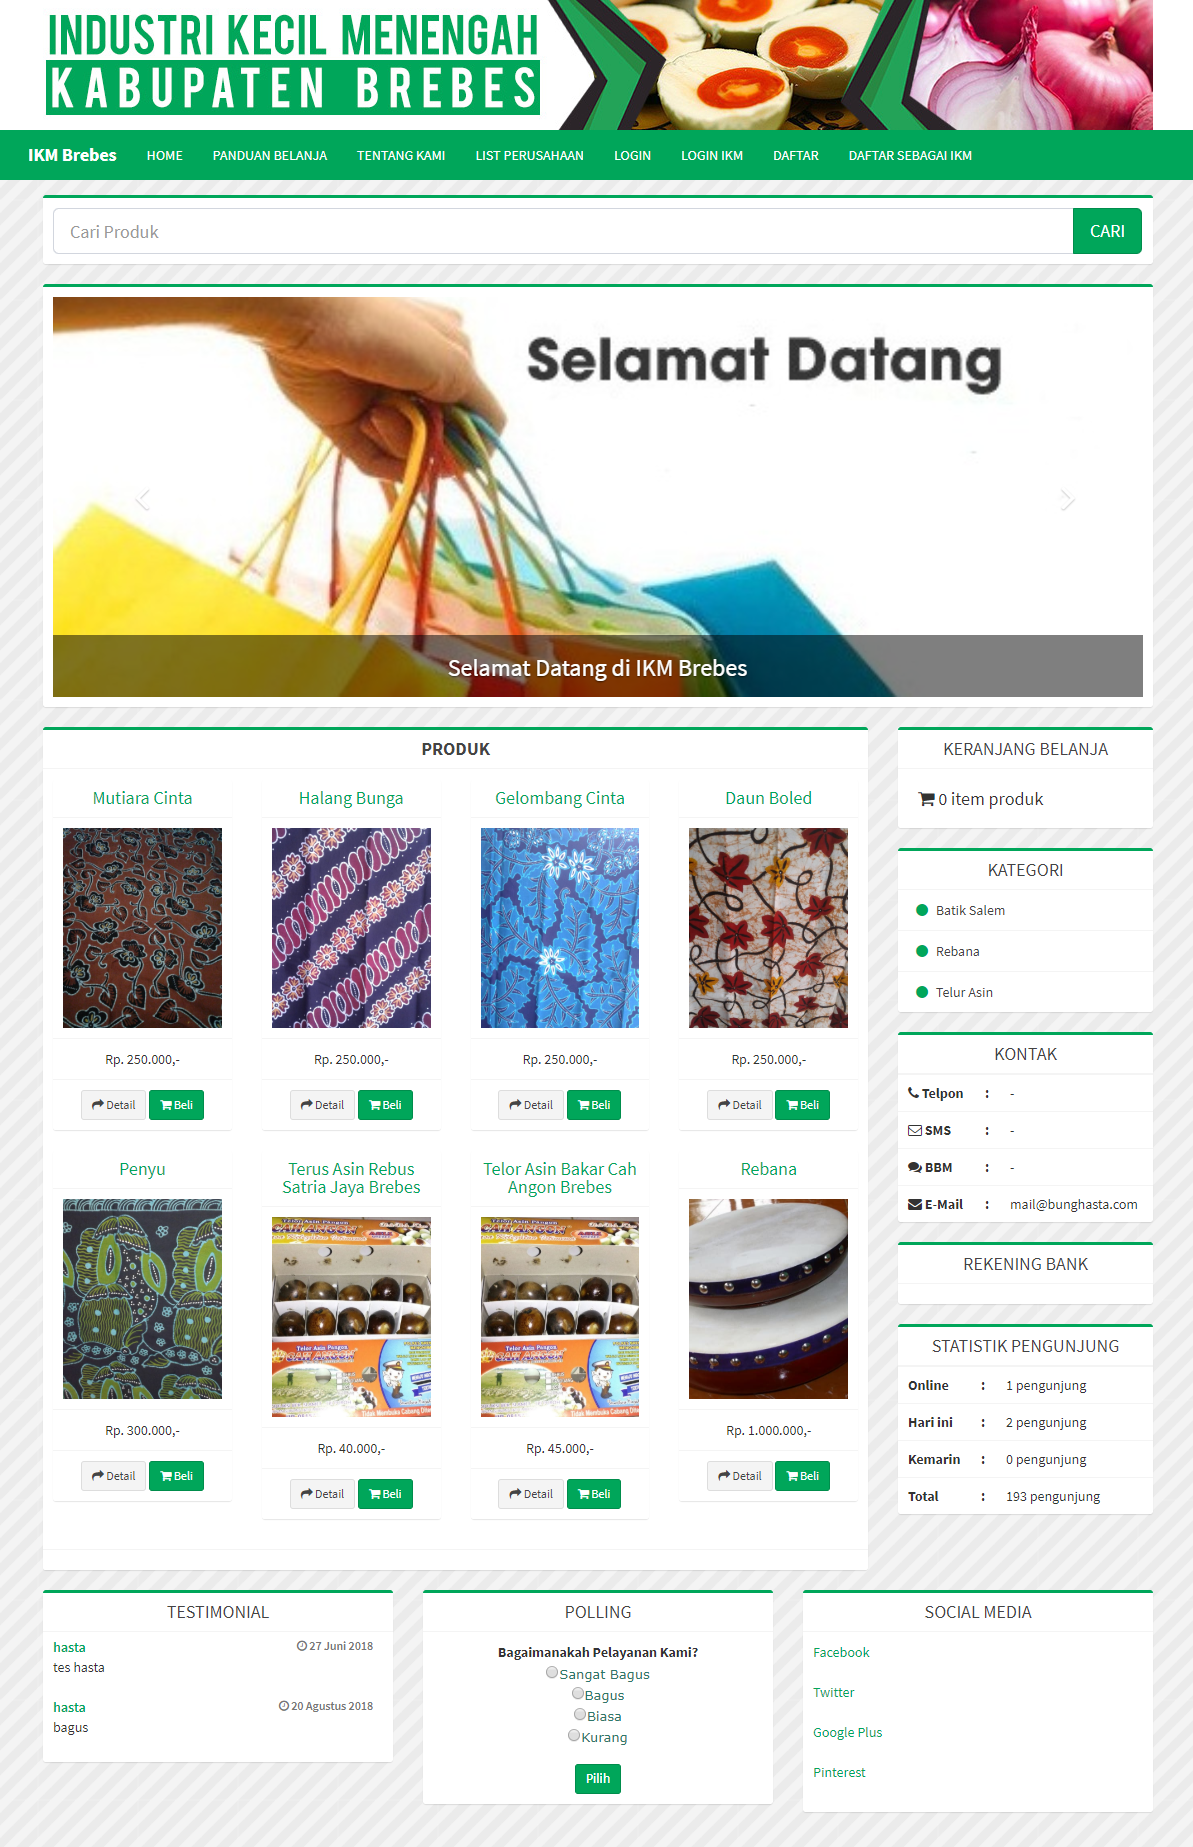 E-Commerce Industri Kecil Menengah (IKM) Brebes